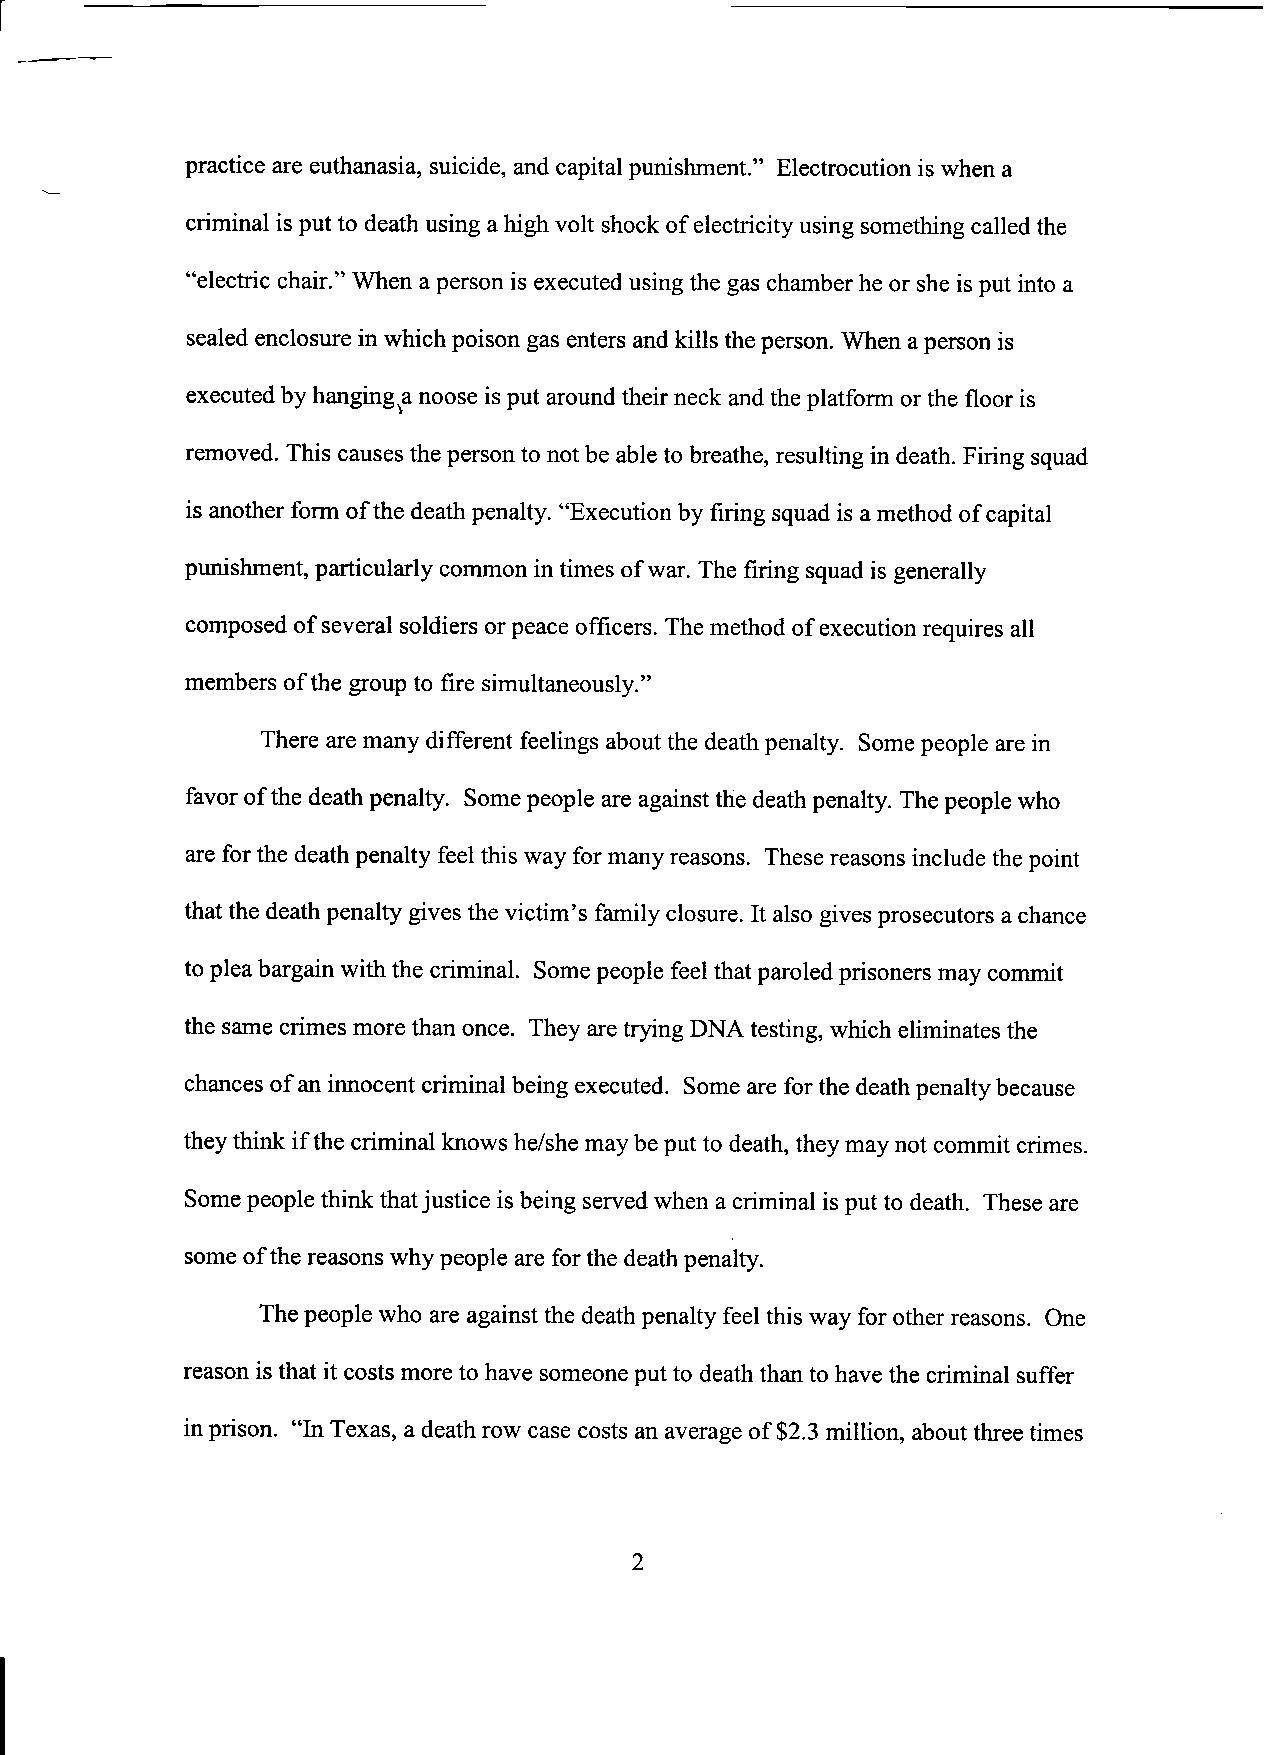 002 Death Penalty Essays Pg Essay Sensational Anti Conclusion Hook For Pro Argumentative Full